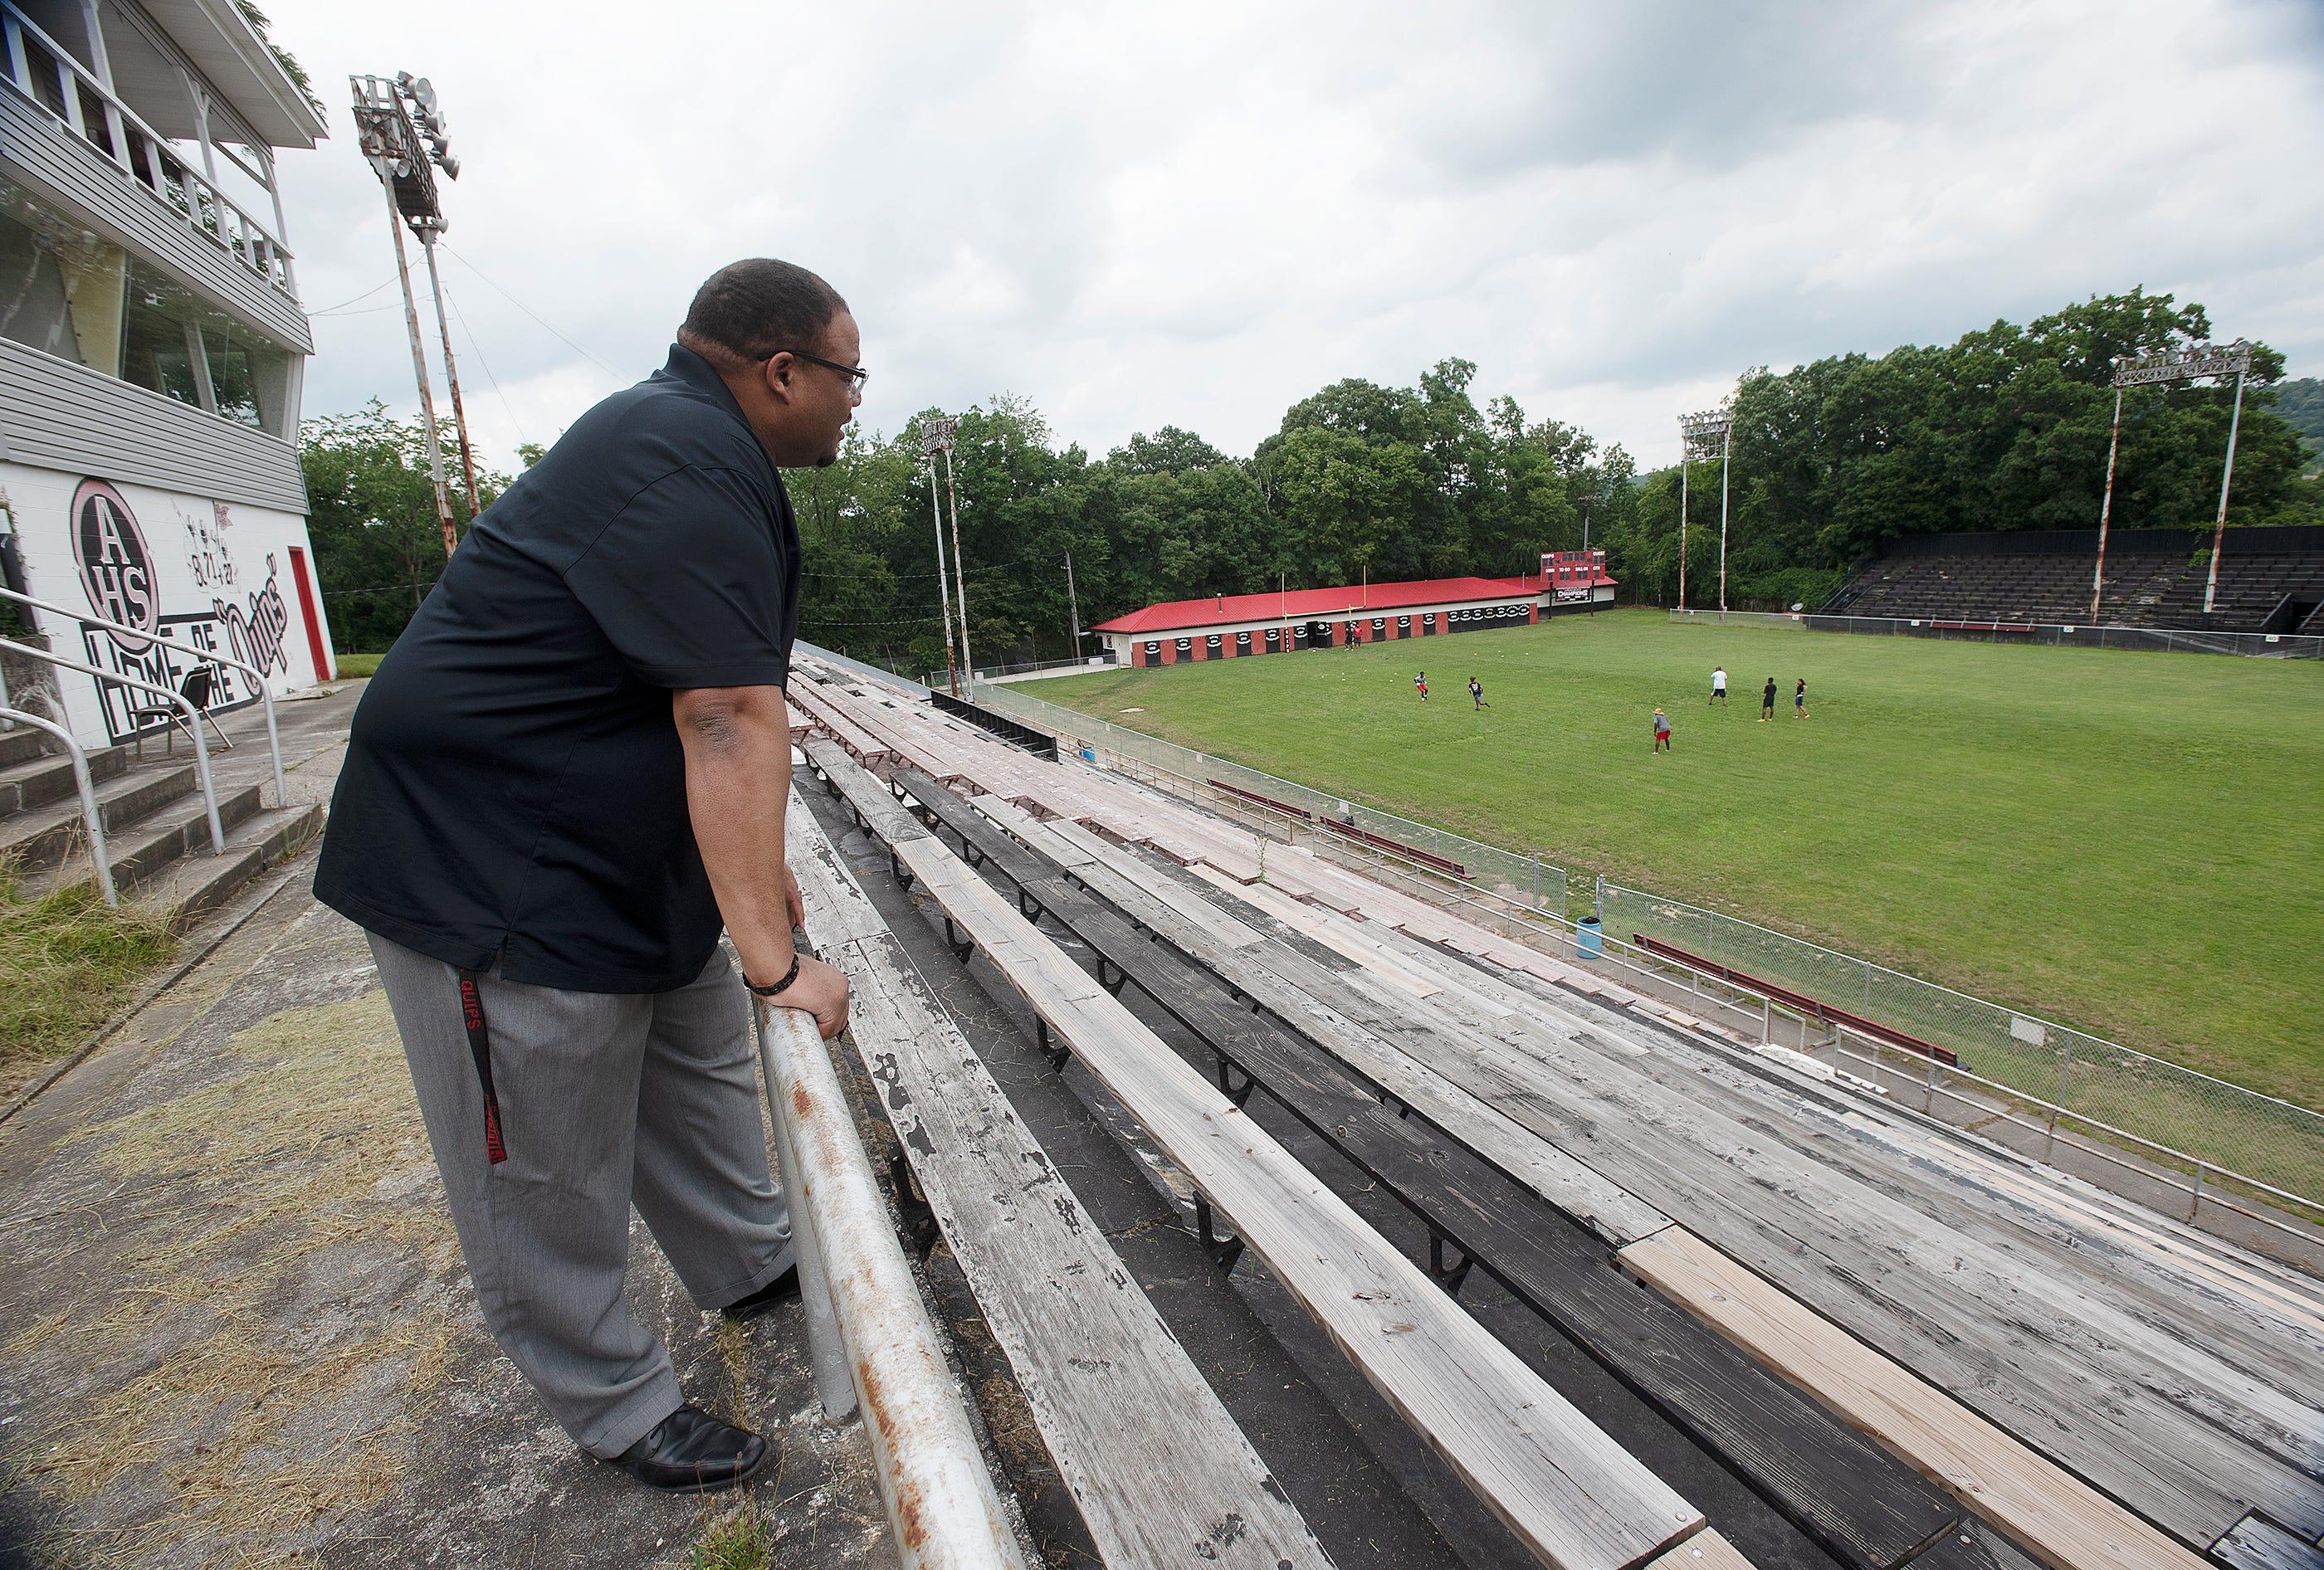 Aliquippa Mayor Dwan Walker watches a few players practice on July 15, 2021, at Carl A. Aschman Memorial Stadium.